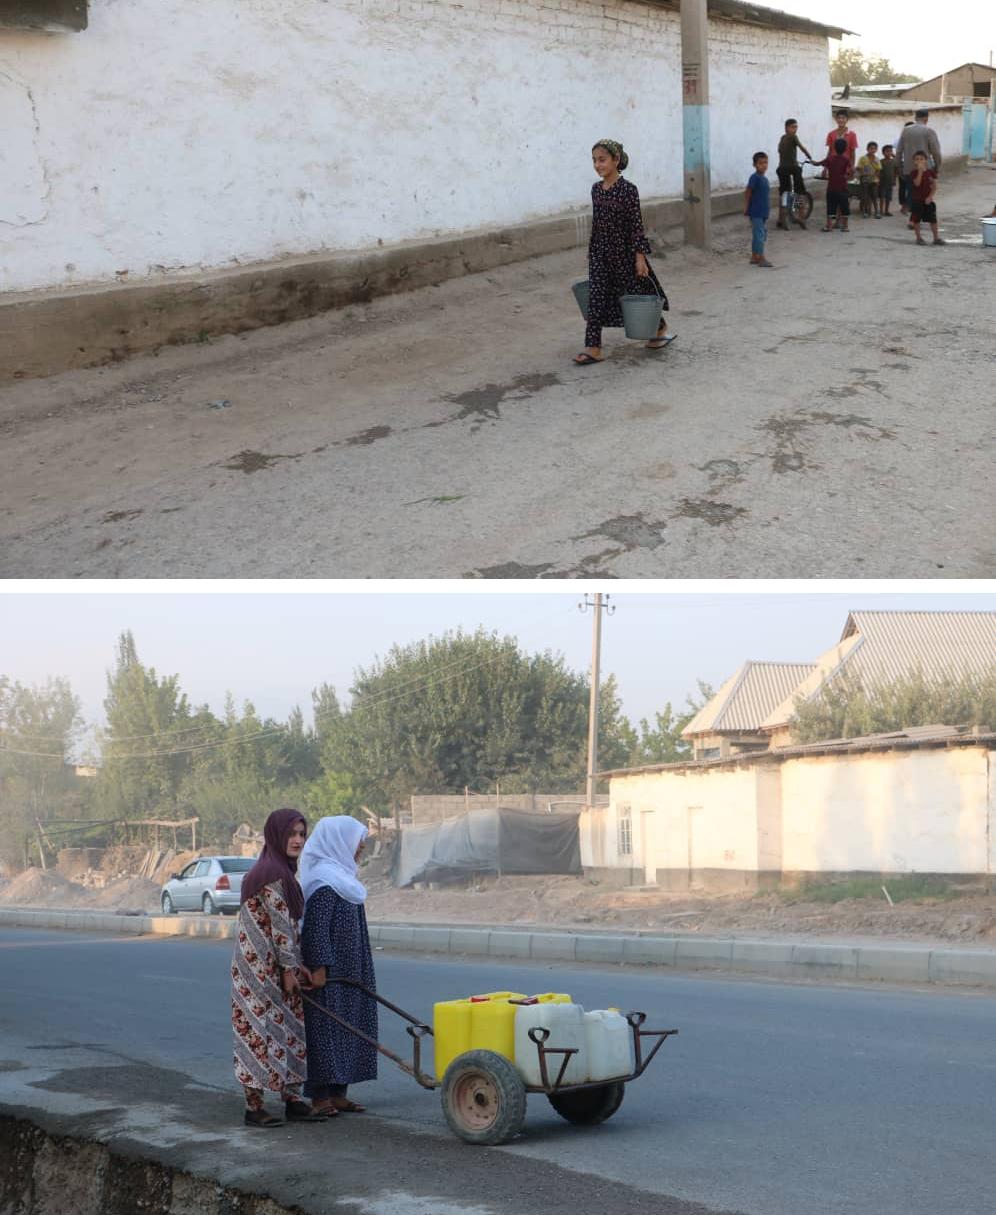 Two women fetching watr using trolleys, Tajikistan